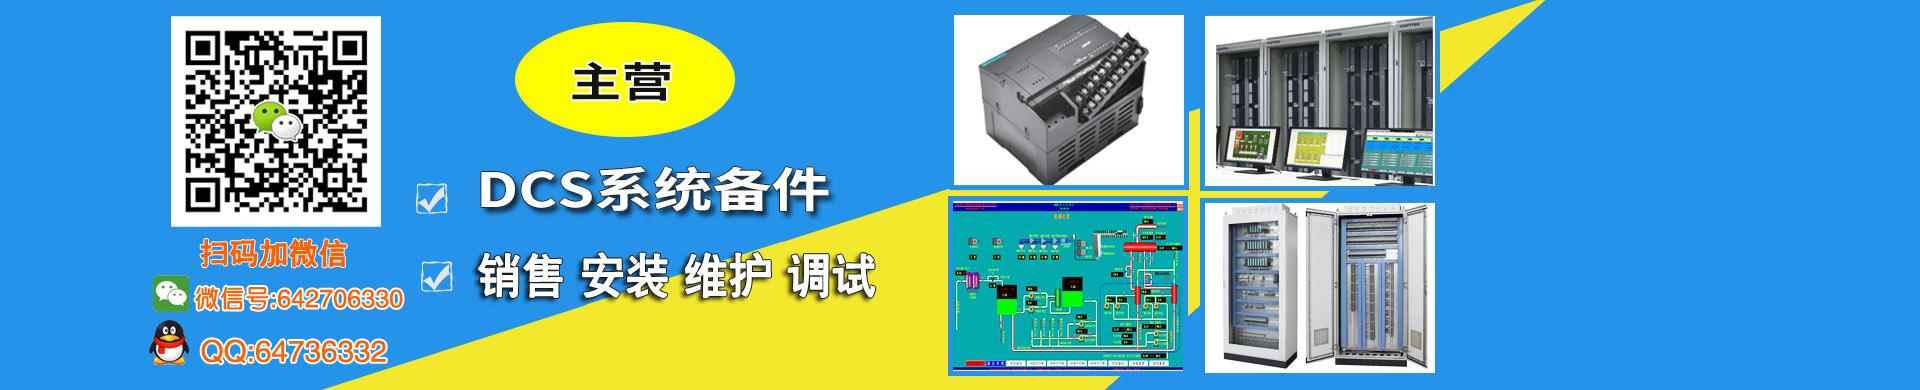 DCS工控备件